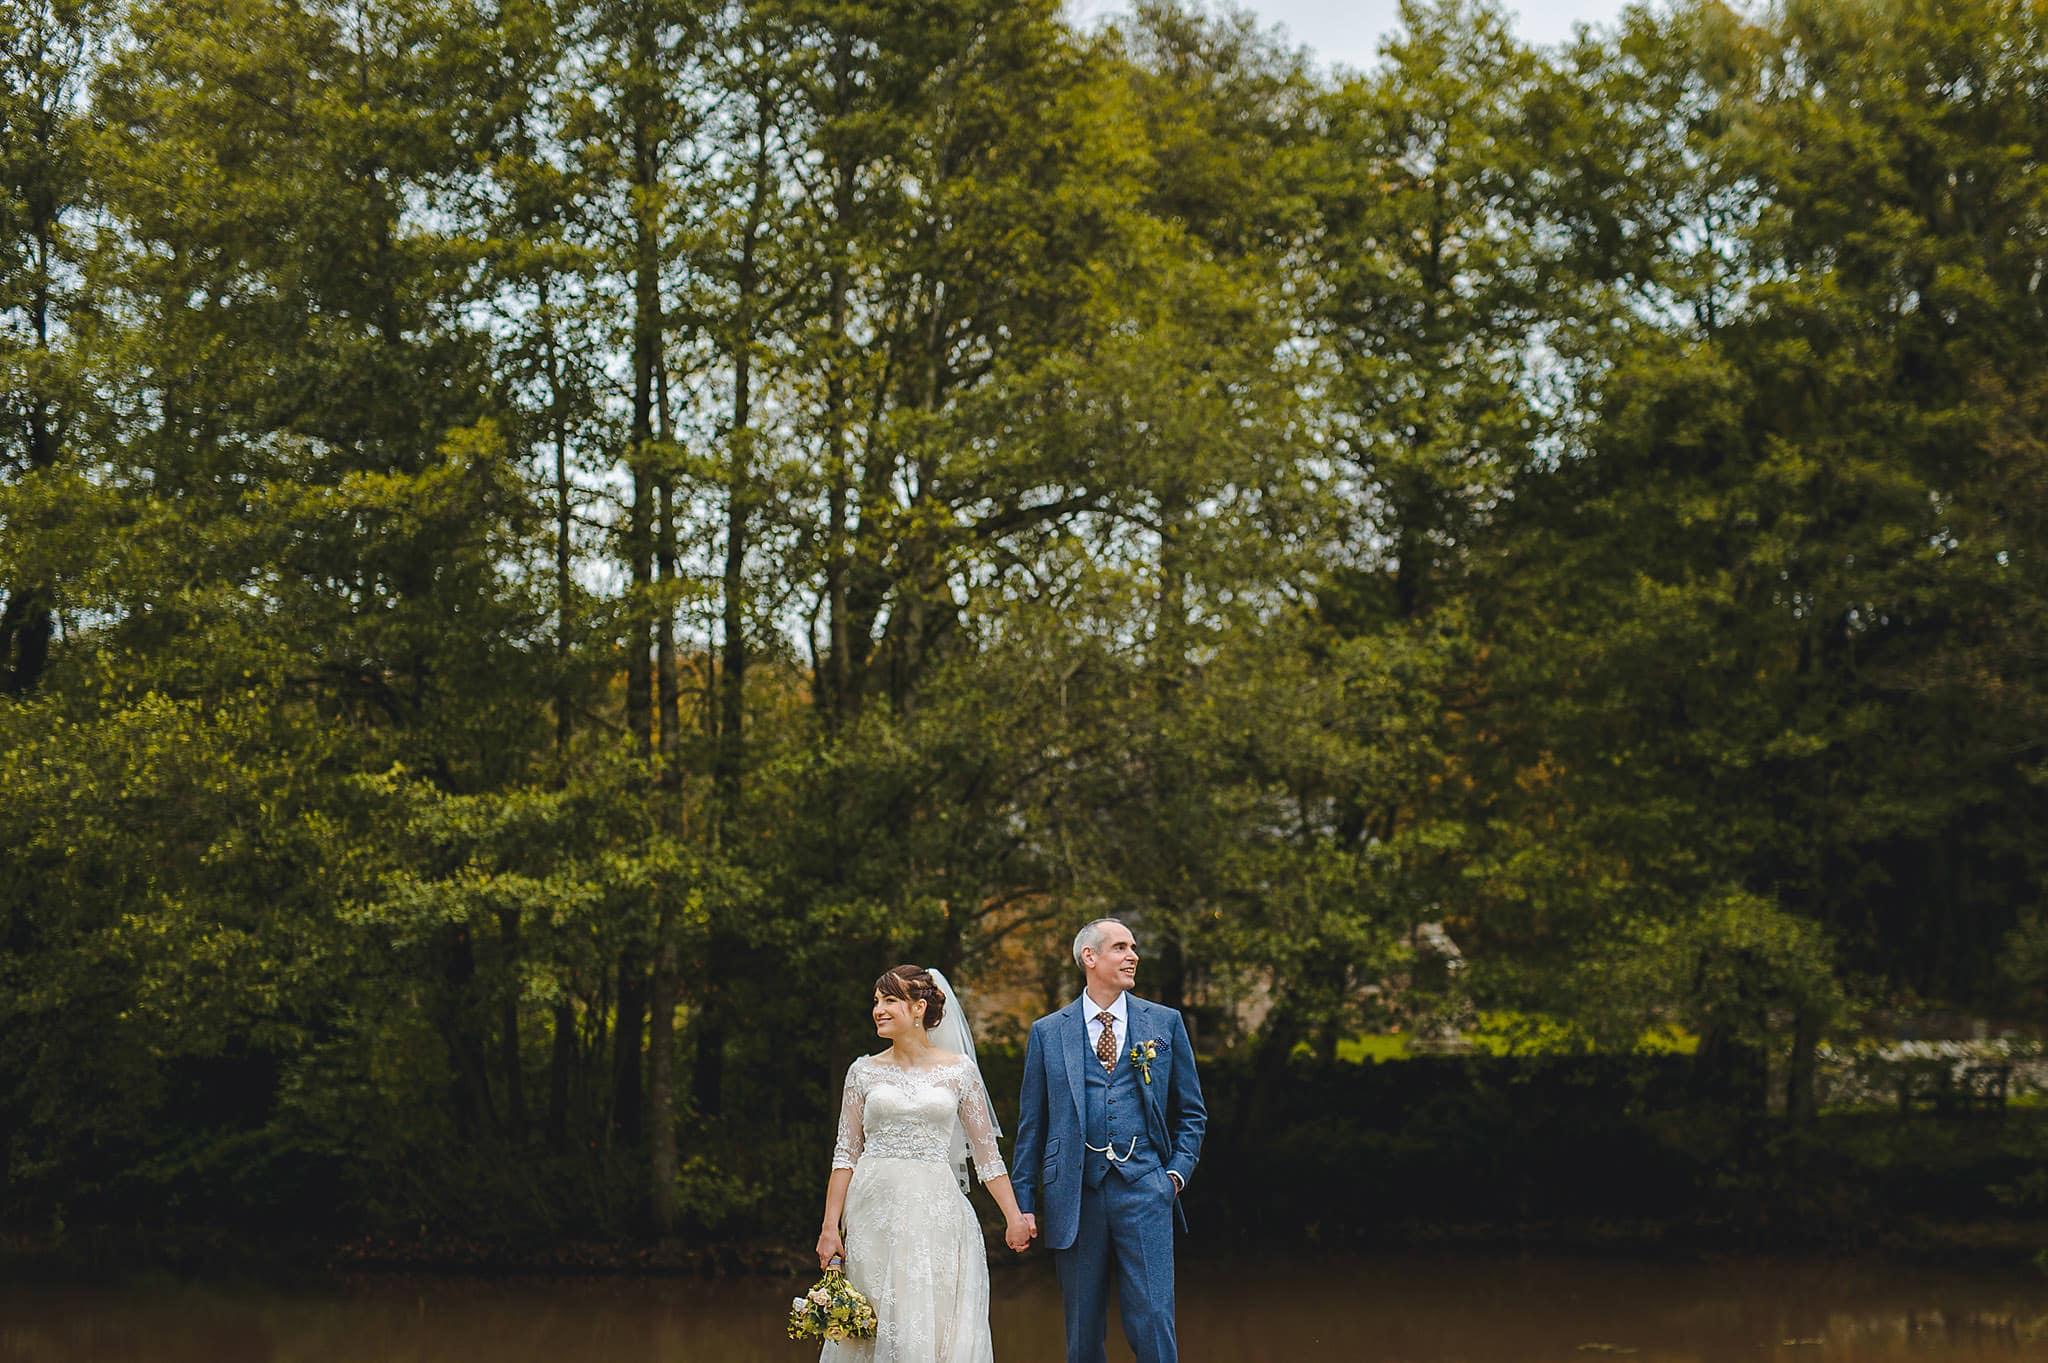 Dewsall Court wedding photography Herefordshire | Laura + Alex 90